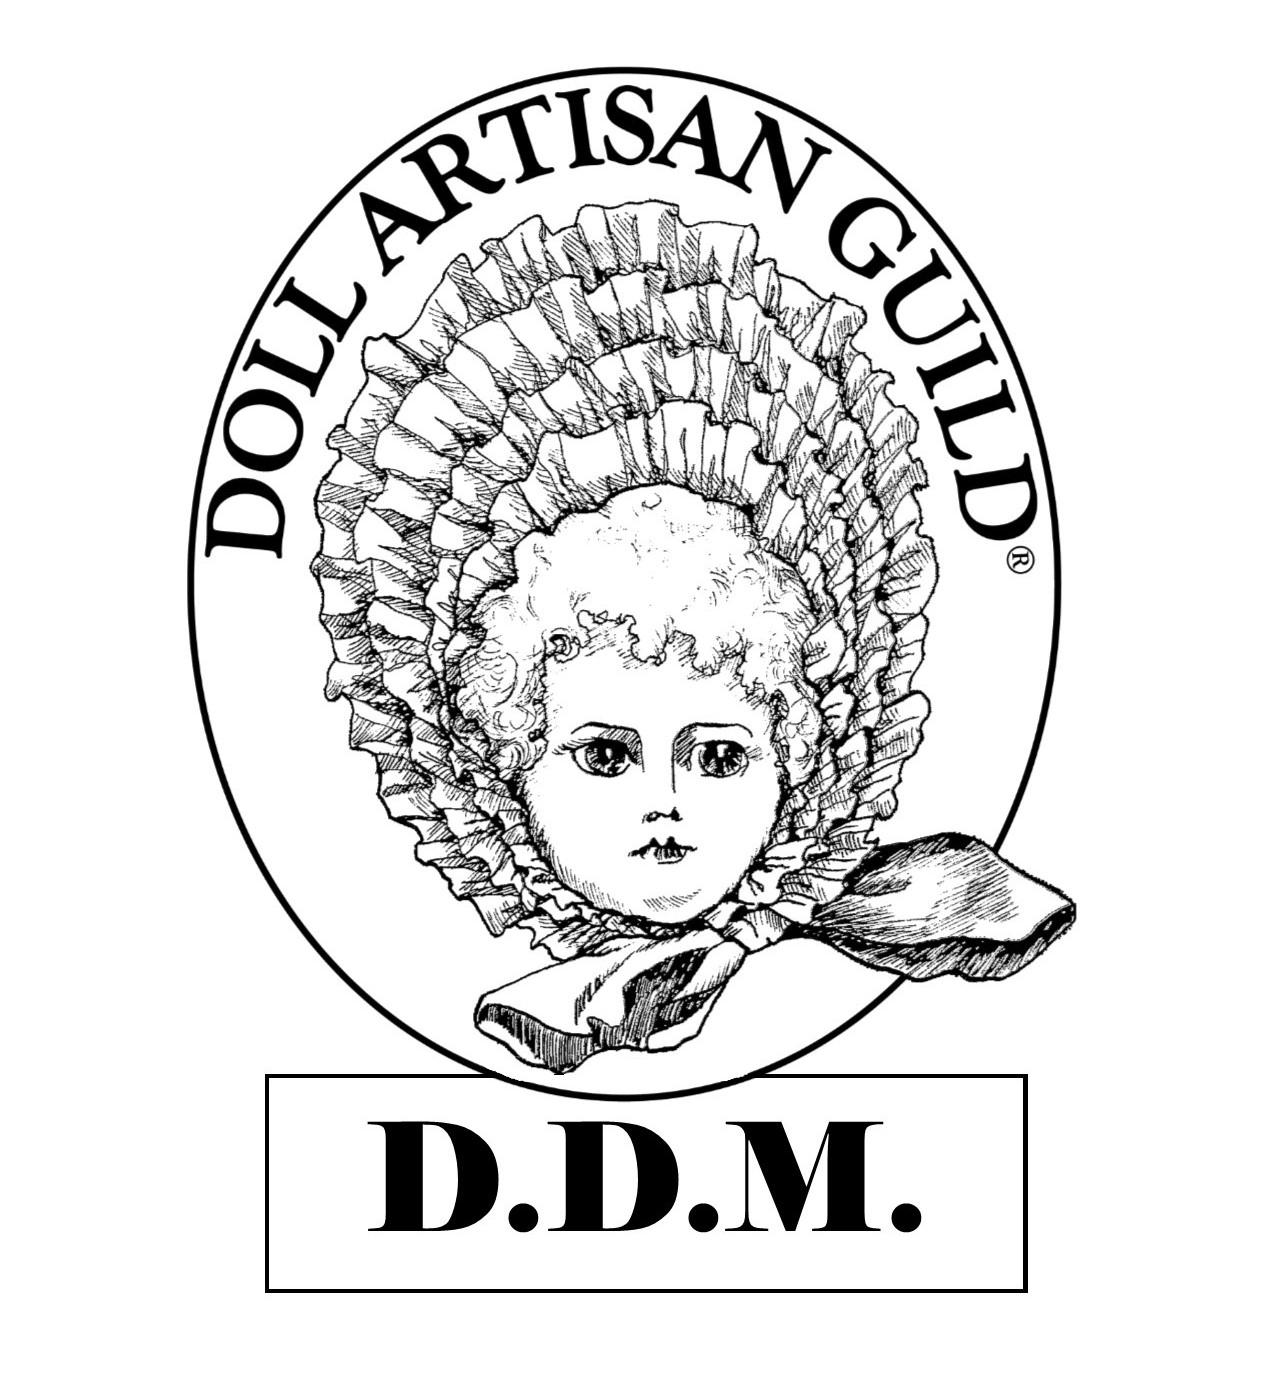 DDM.jpg